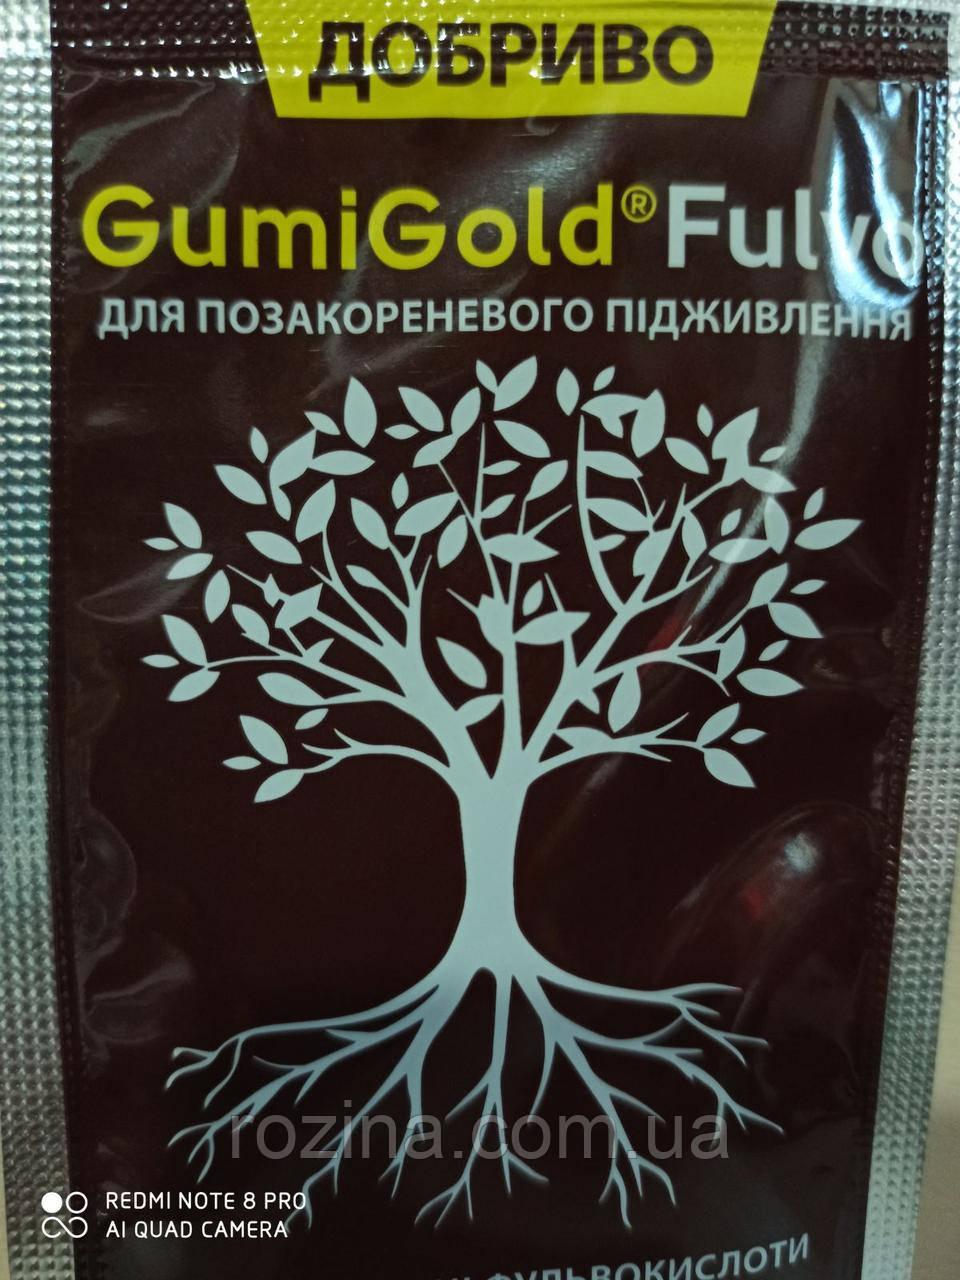 Гуми Голд Фульво — стимулятор роста 5 г